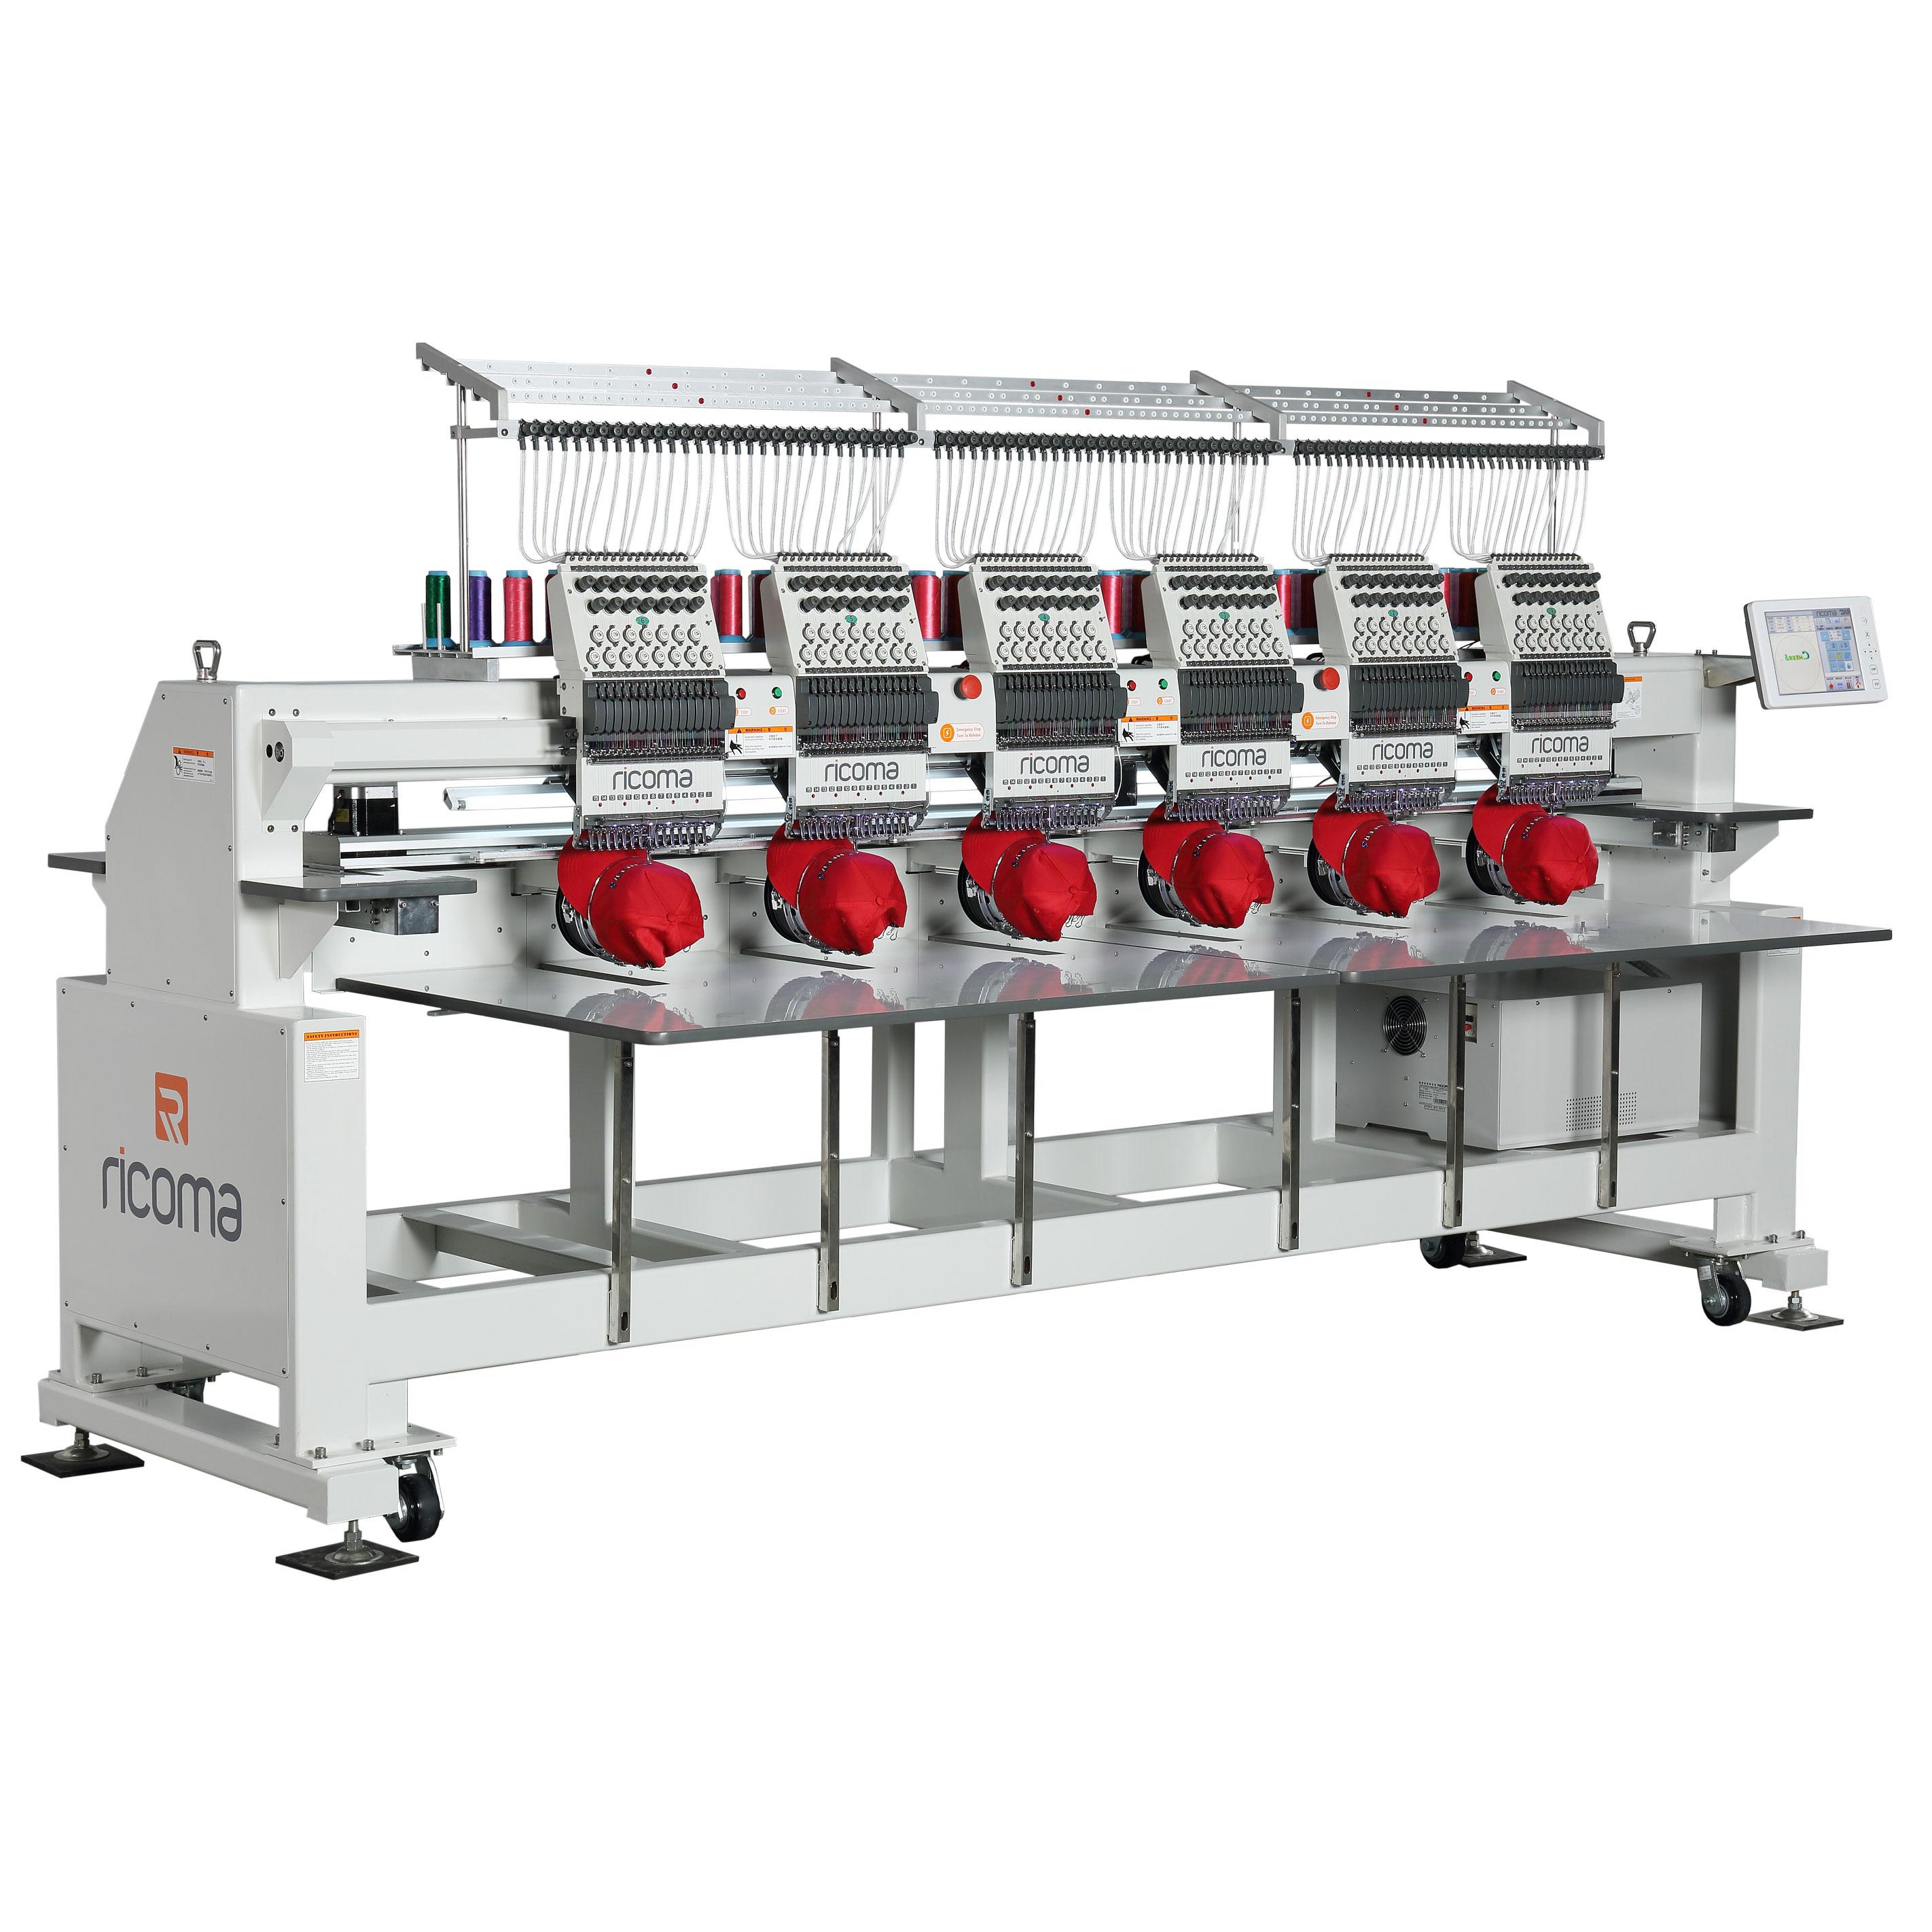 Ricoma CHT-1506 Embroidery Machine